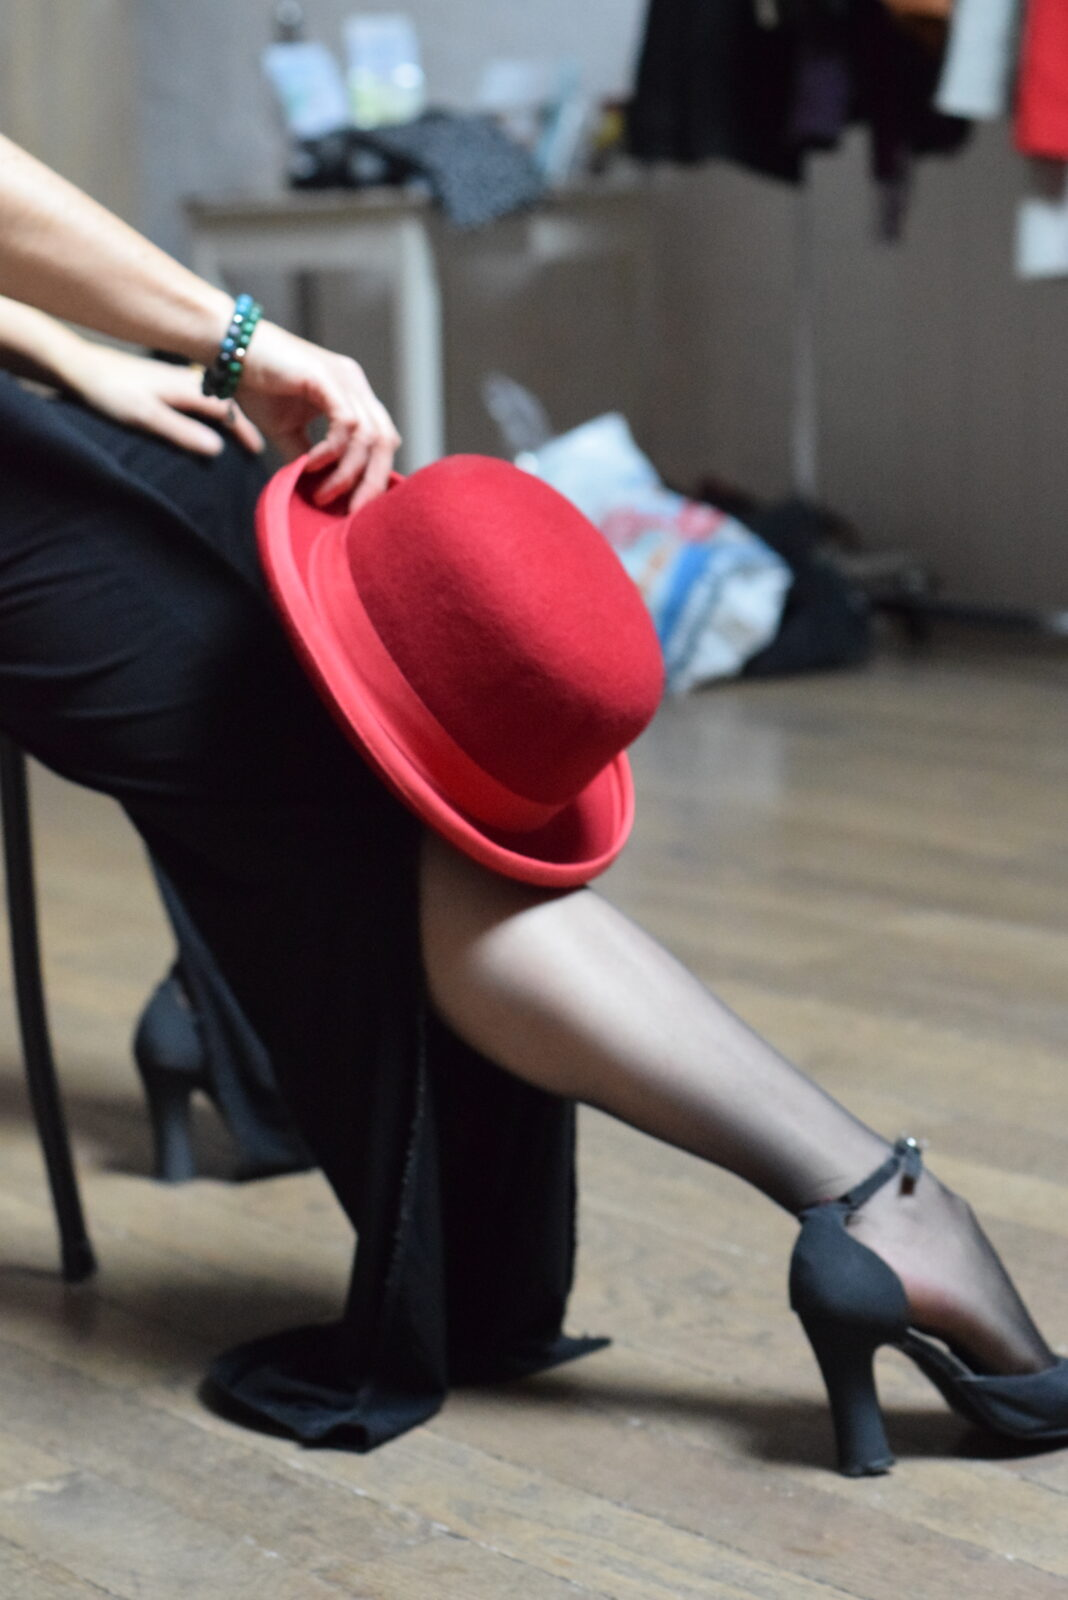 Danser sa sensualité en mode cabaret le samedi 17 avril